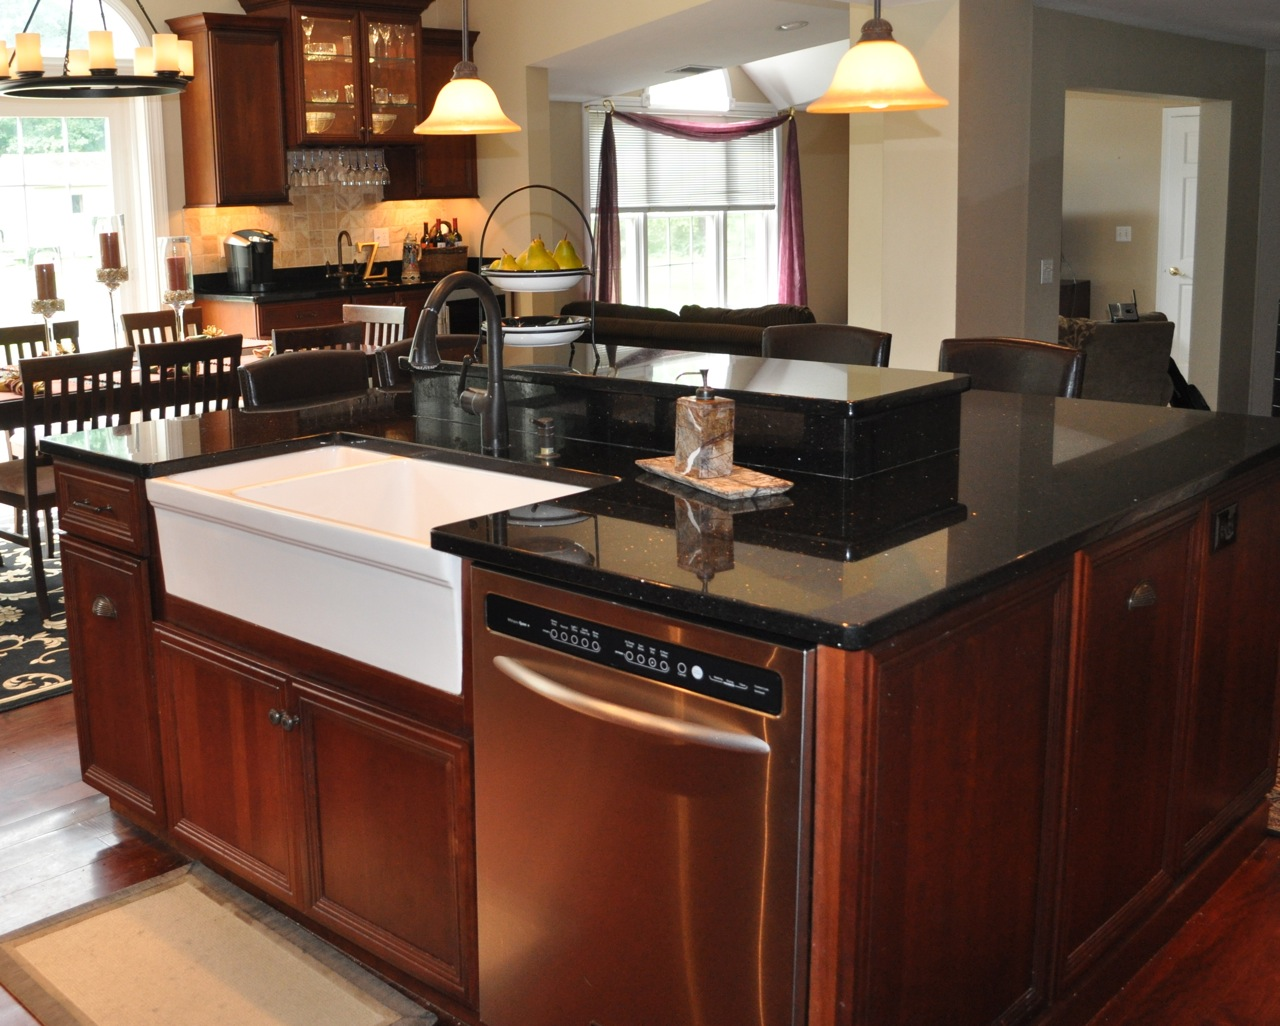 Black Granite Kitchen Countertops Black Granite Counter Tops For Kitchen